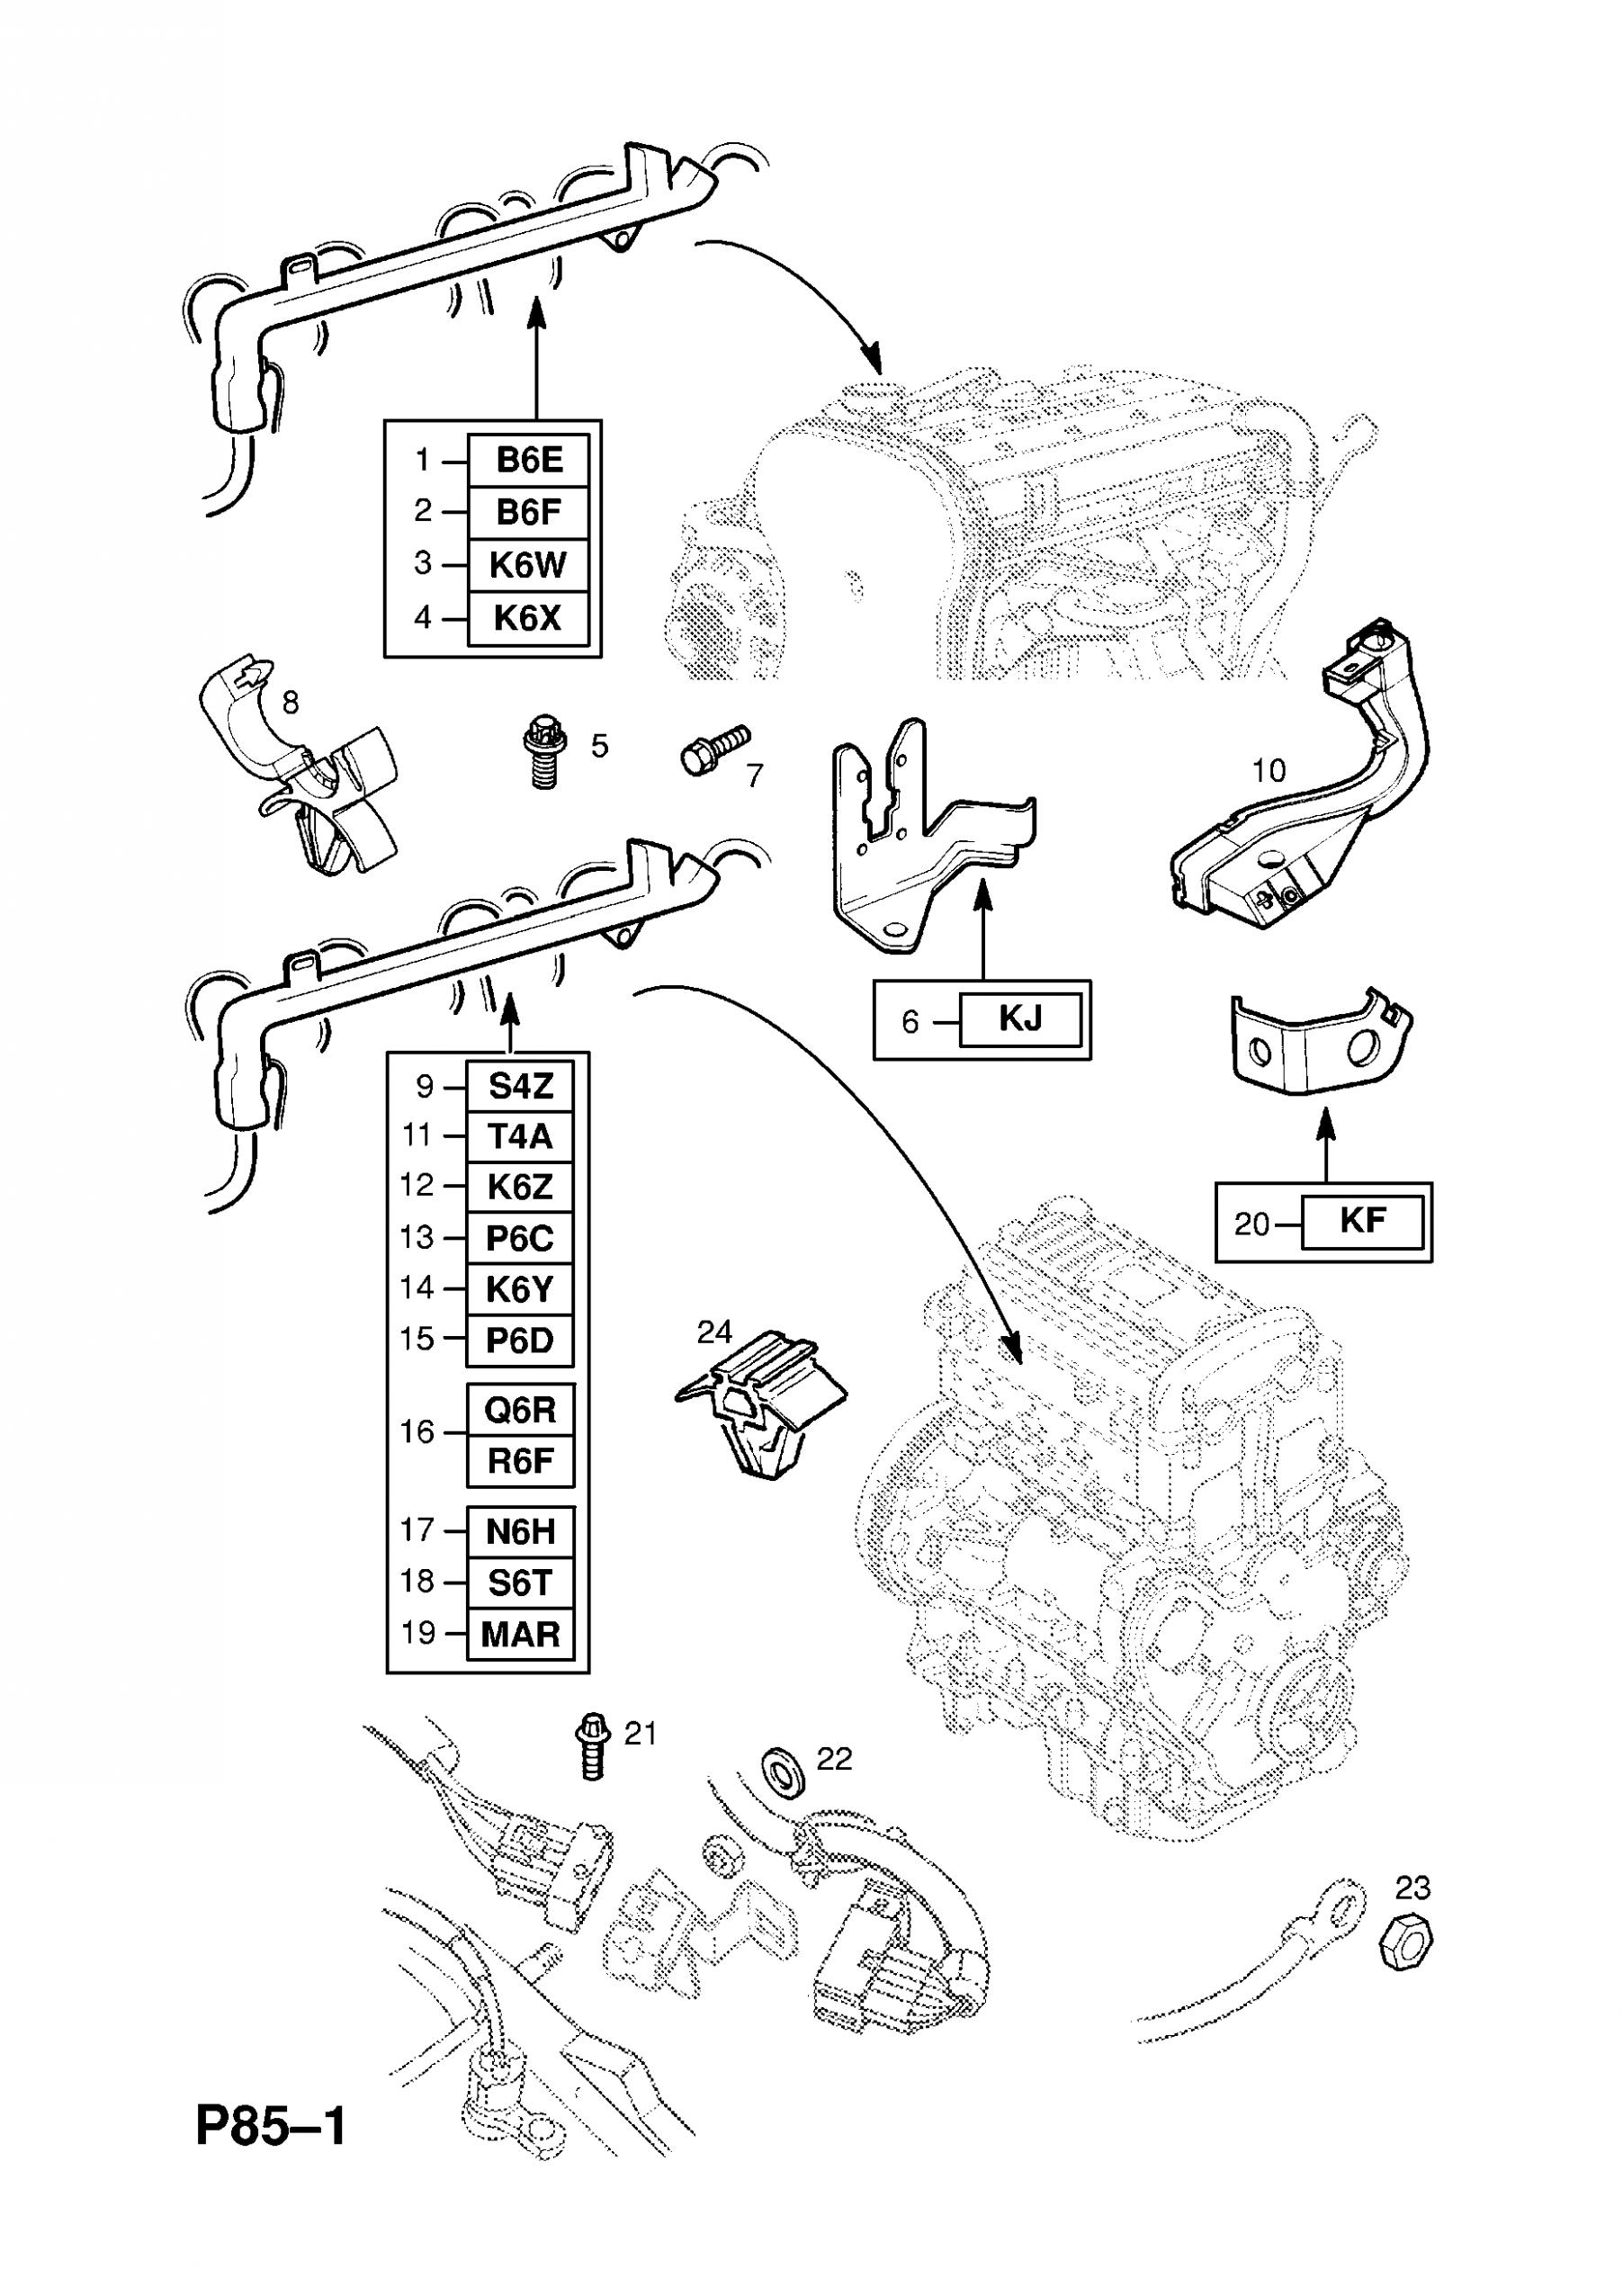 [12+] 2006 Ford Fusion Belt Diagram And The Description